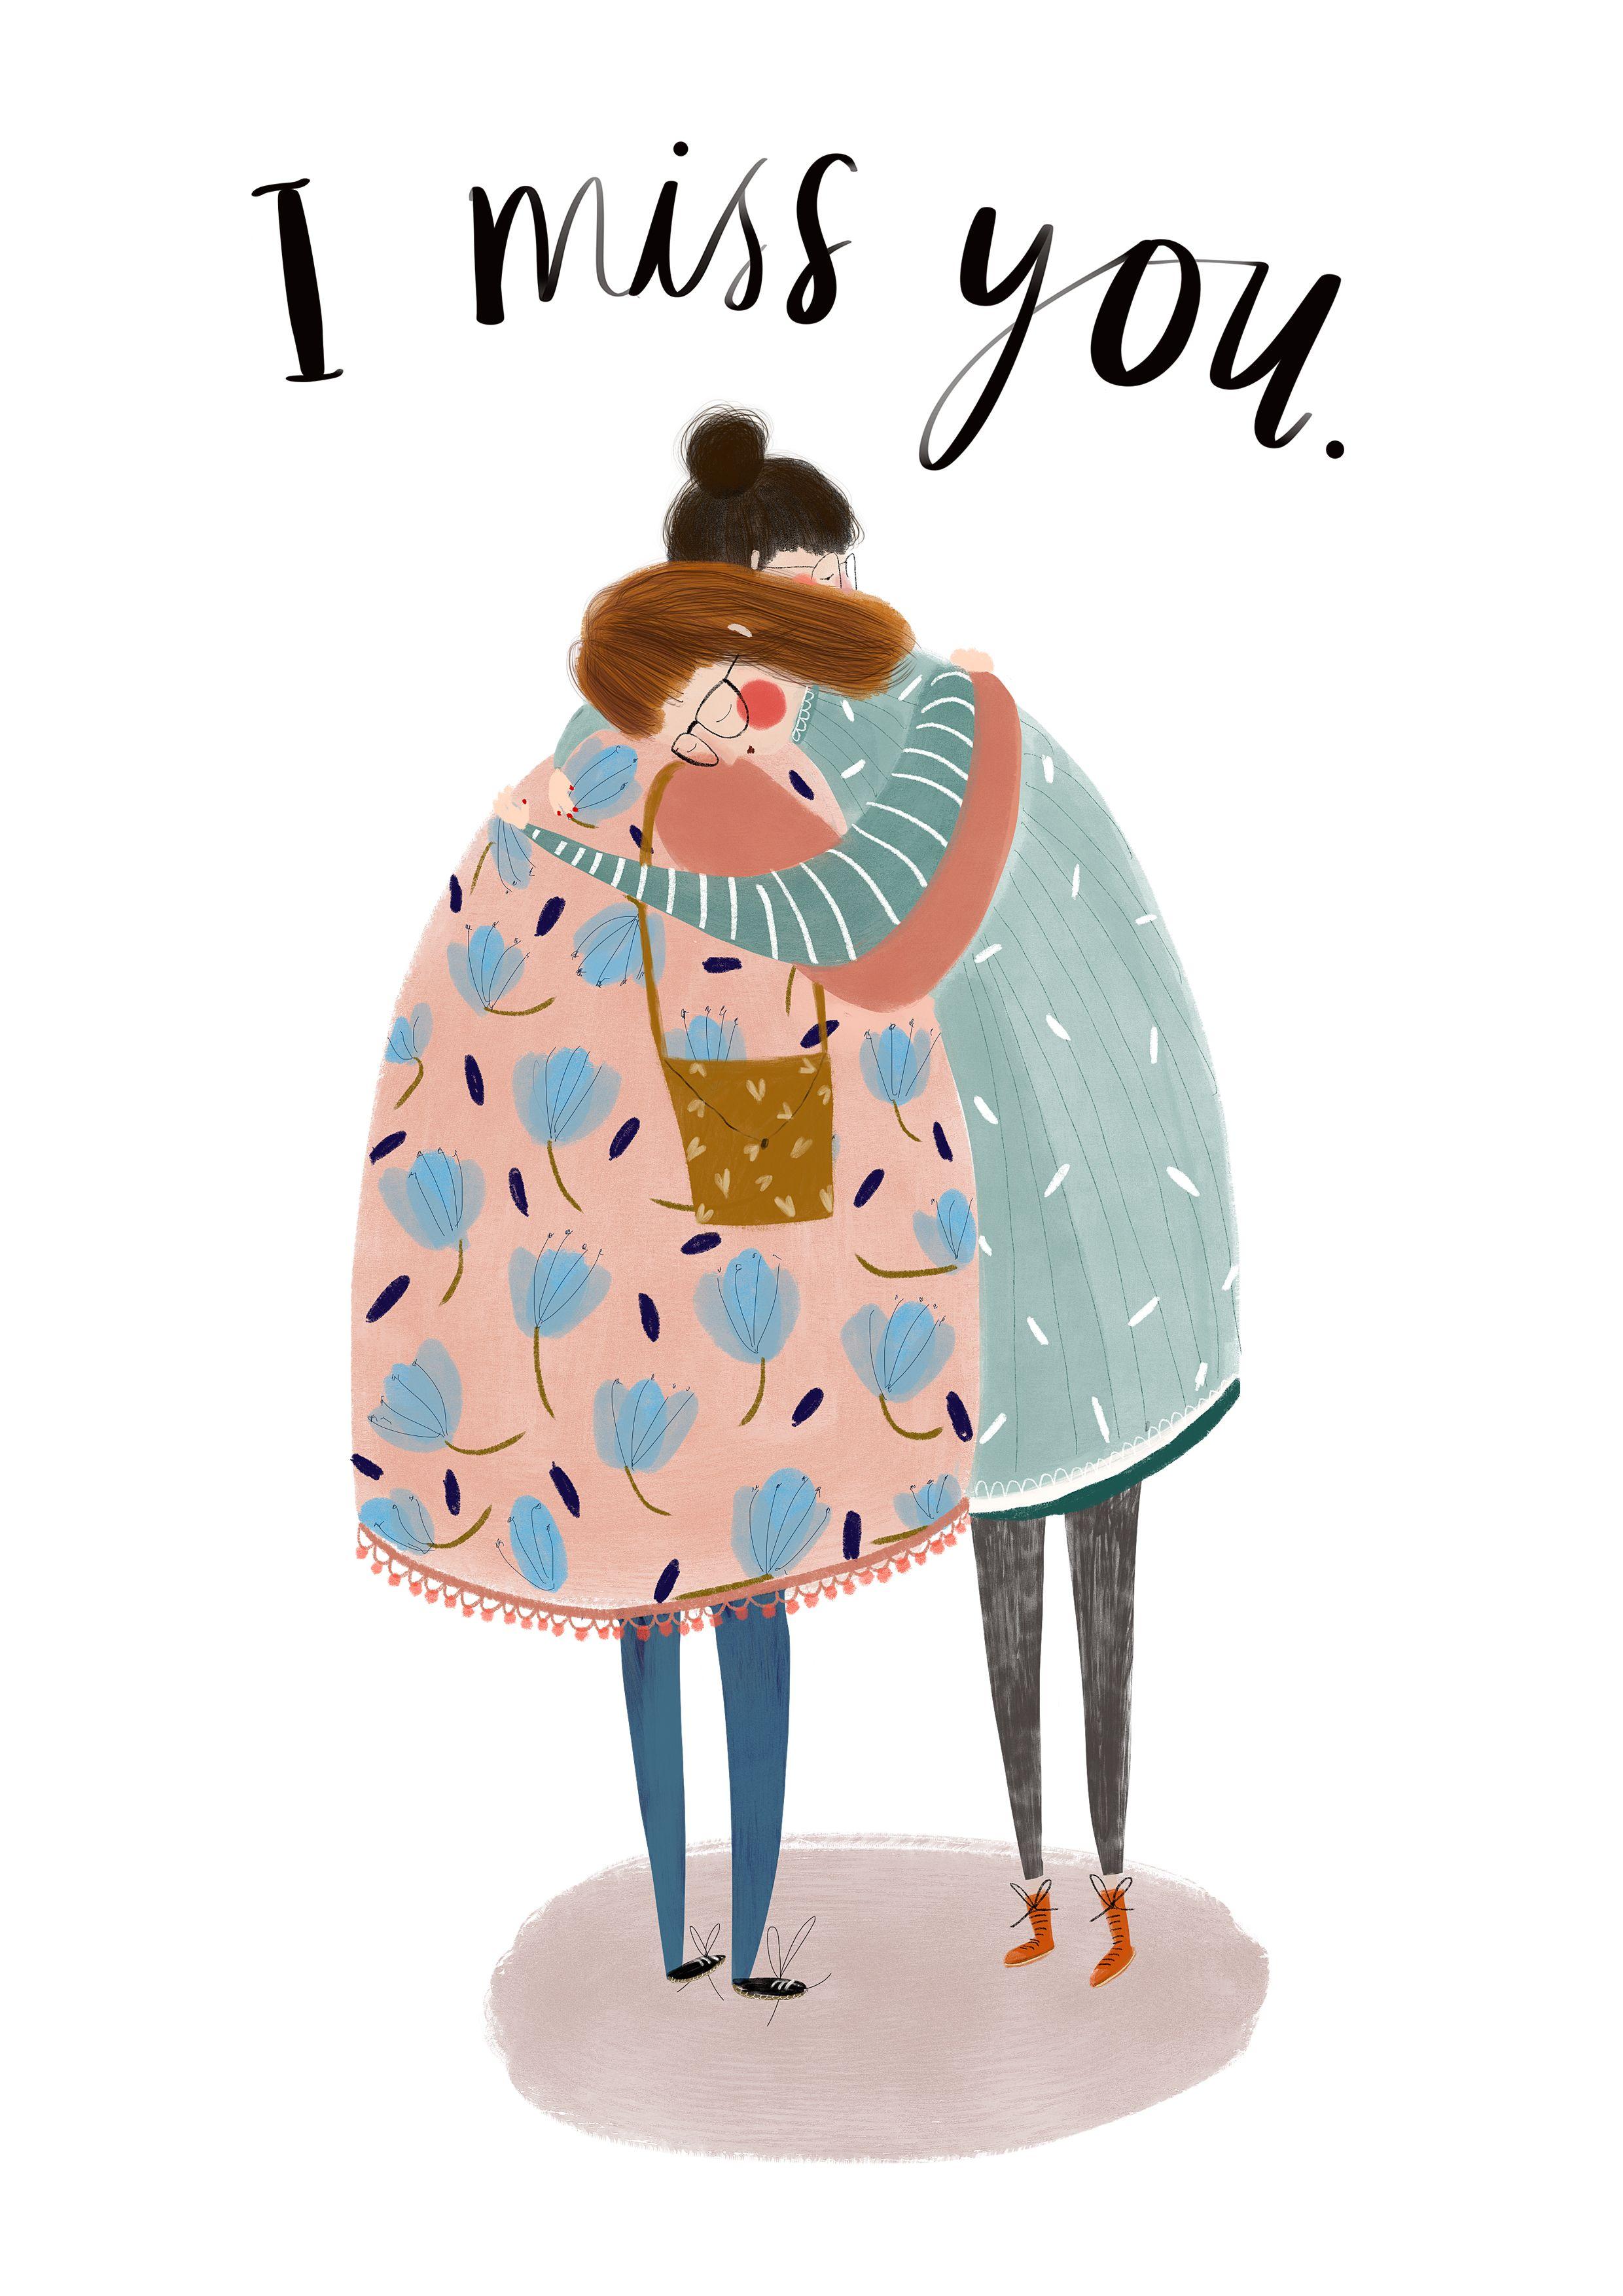 Greetings Cards, Gifts & Homewares | Katy Pillinger Designs